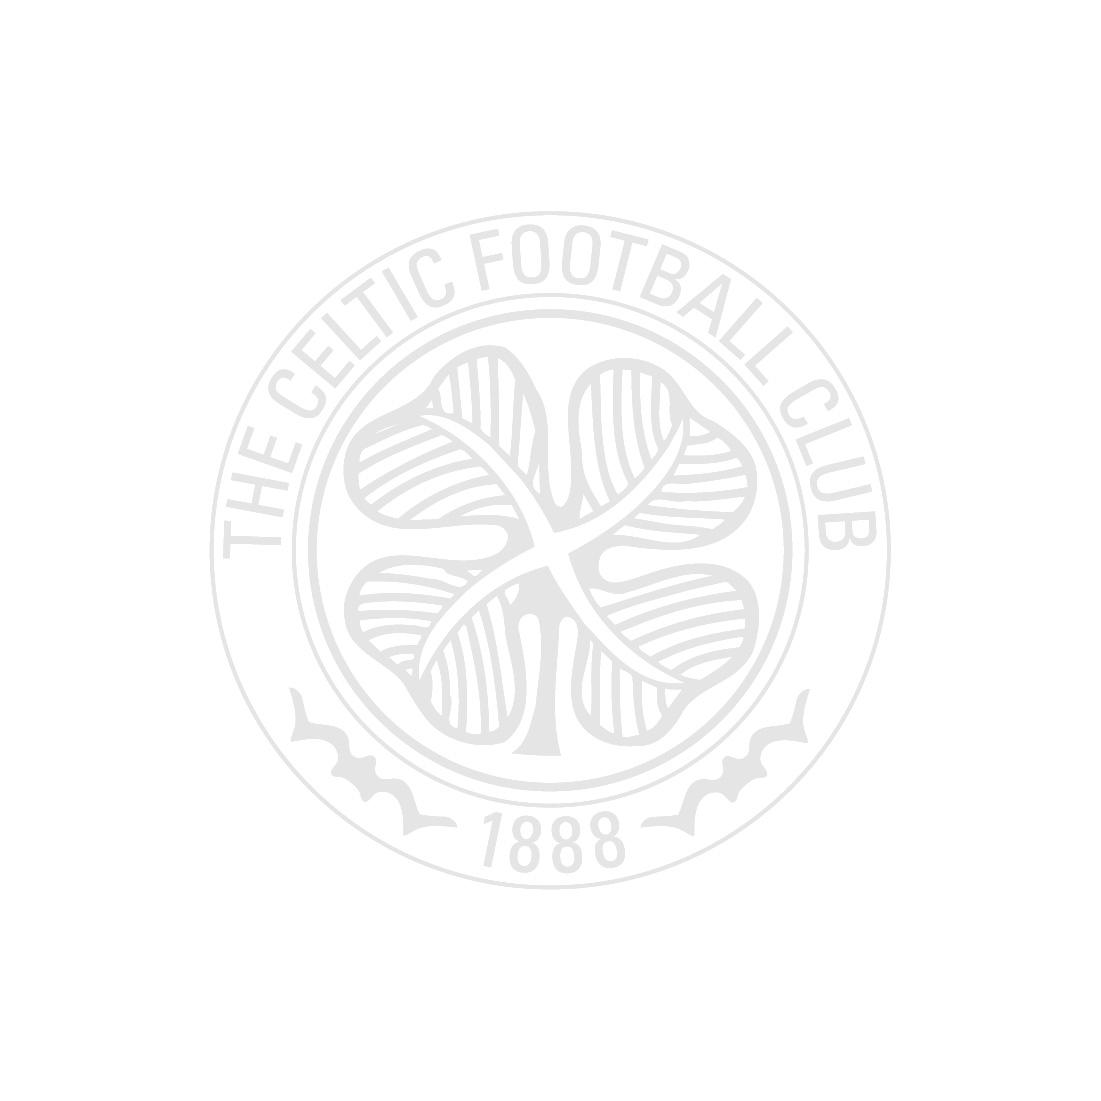 Celtic Larsson Signed Seville Goal Print